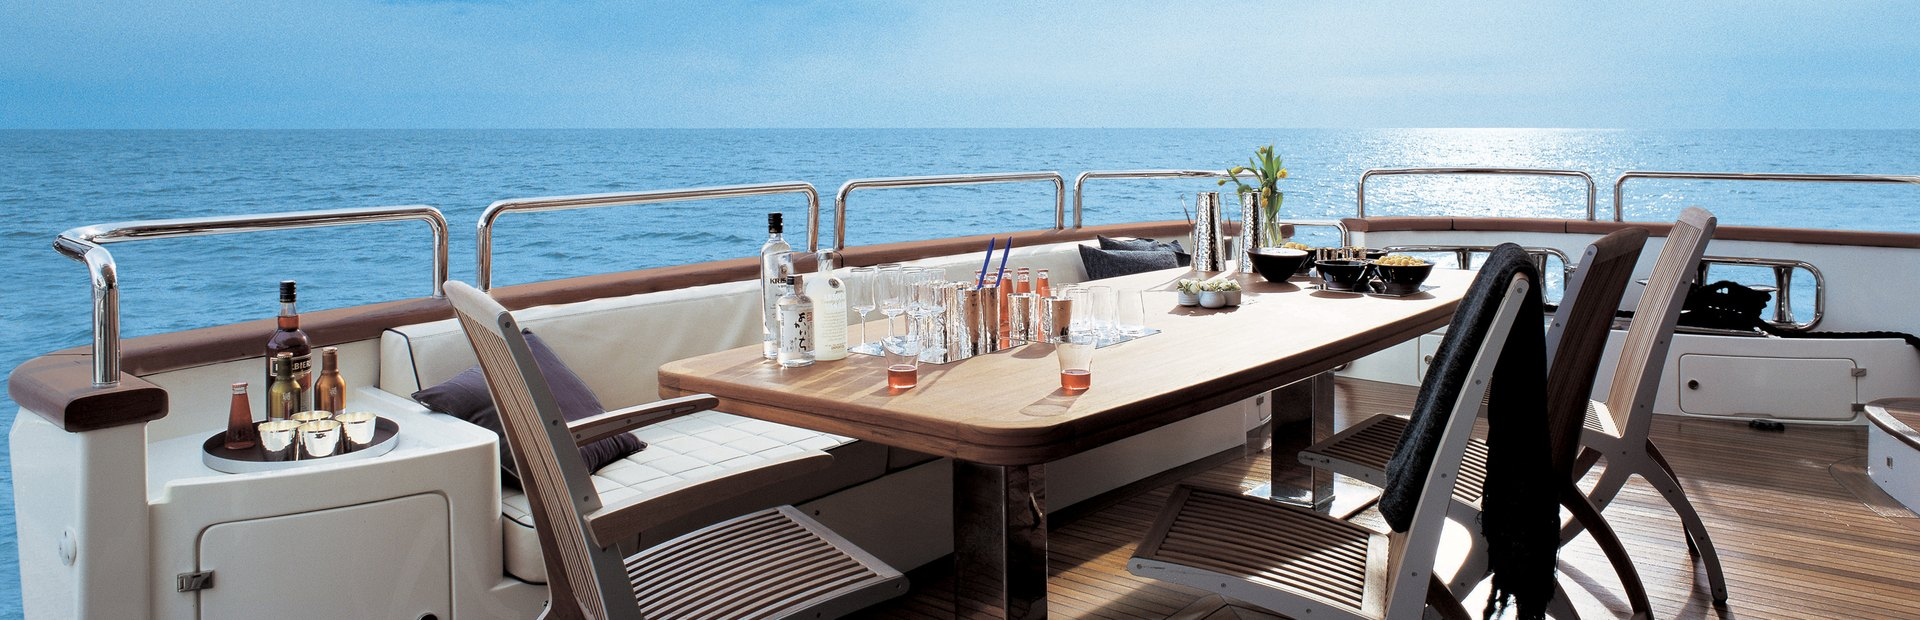 Grande 105 Yacht Charter